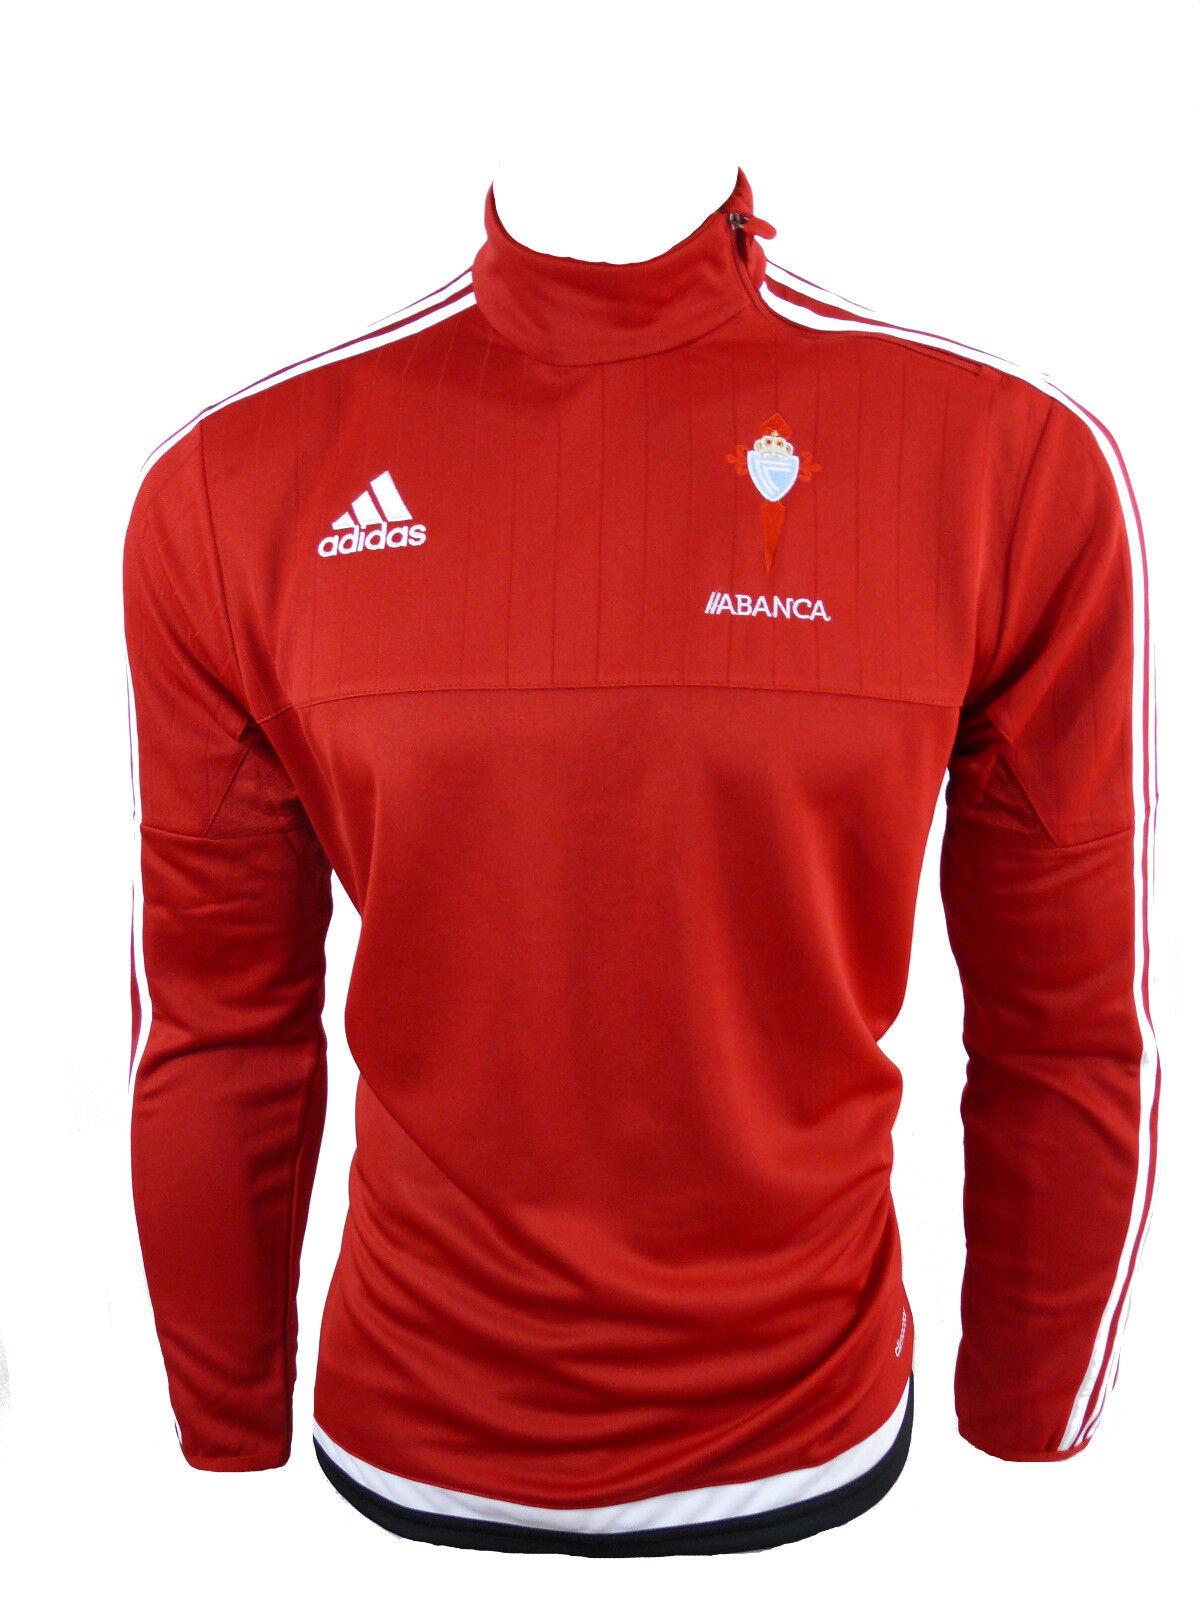 Adidas Celta Vigo Sweatshirt trainings Top Gr.XXL  | Online-verkauf